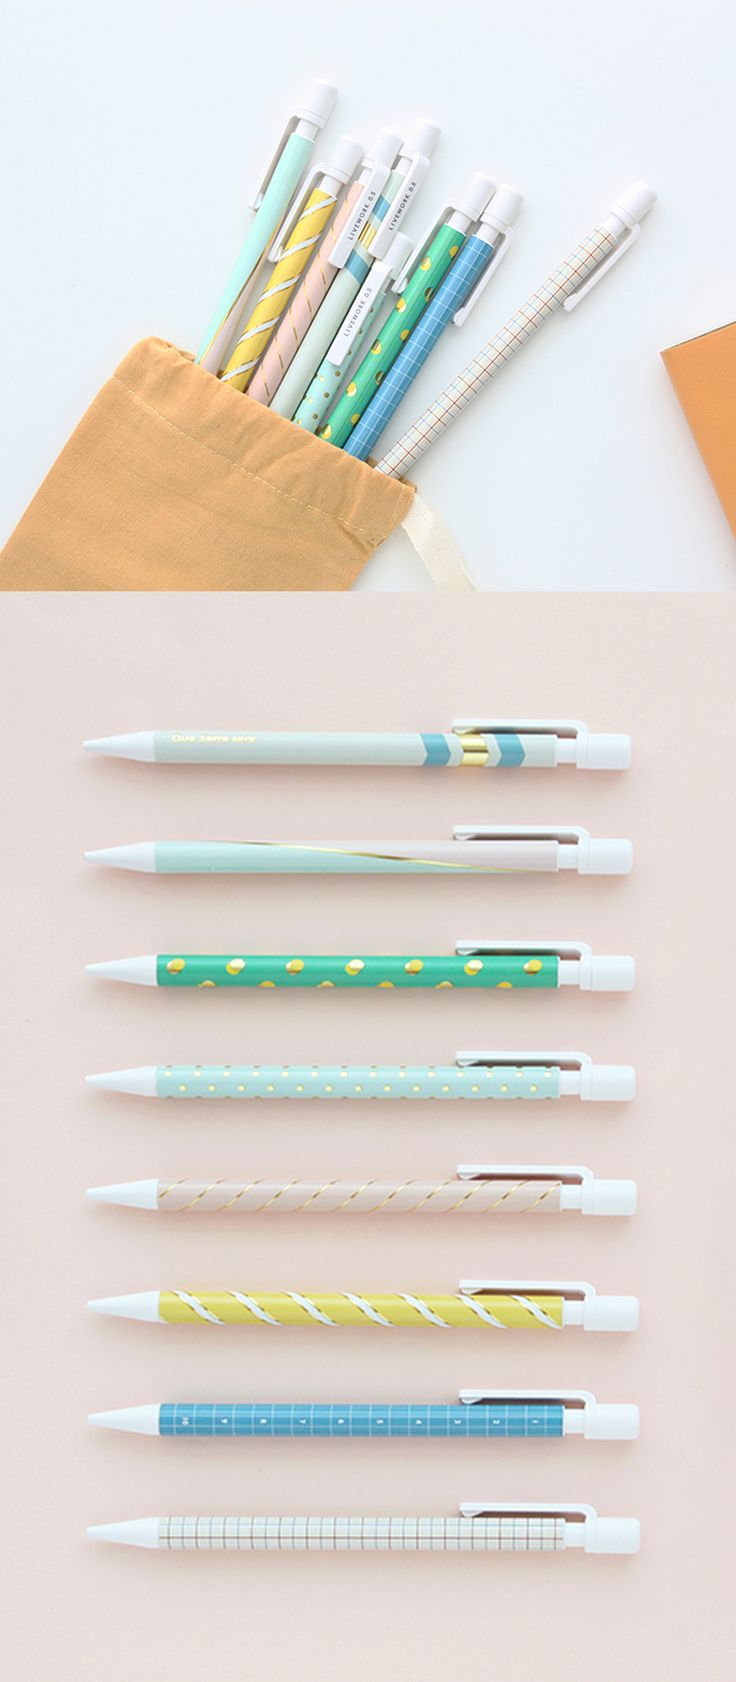 Liquid Lead Pencil Best 20 Led Pencils Ideas On Pinterest Chemistry Past Papers